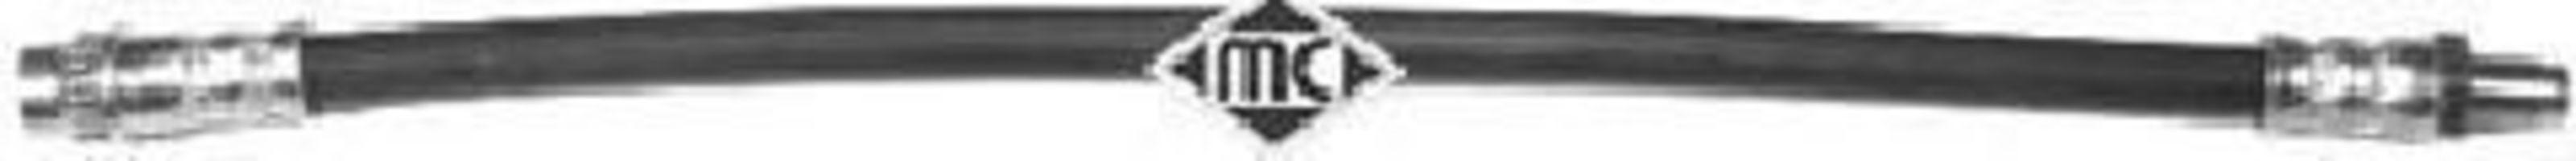 Шланг тормозной METALCAUCHO 96078